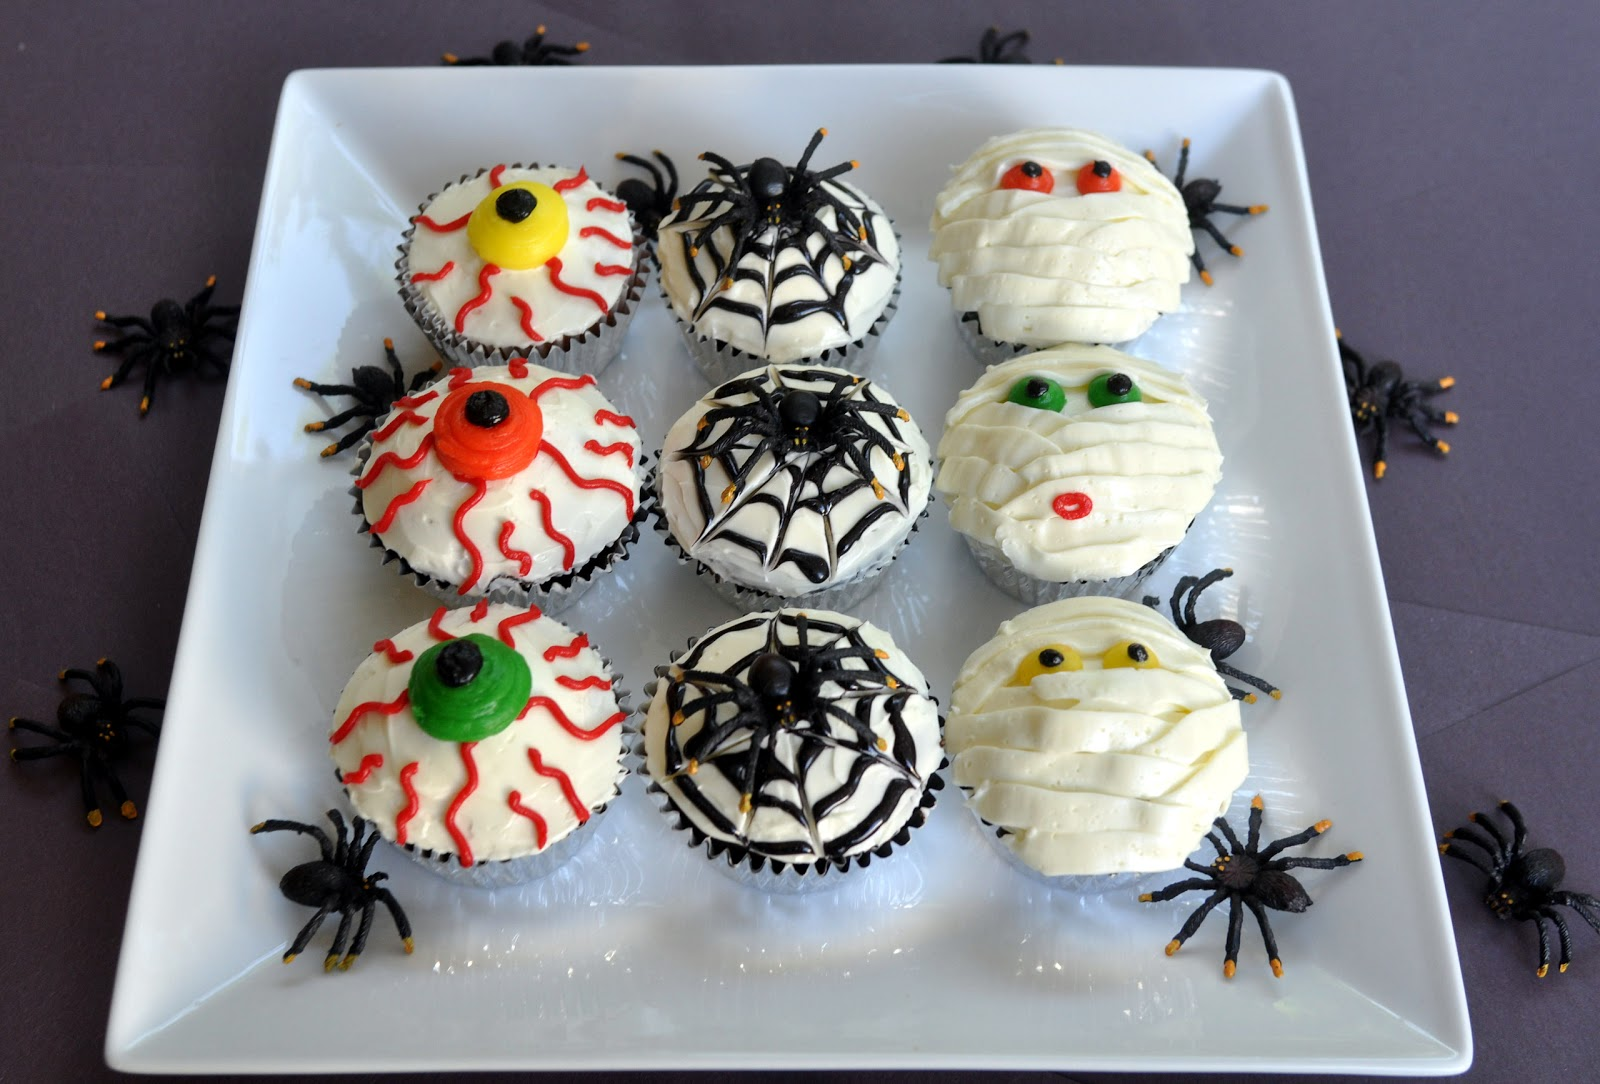 beki cook's cake blog: halloween cupcakes